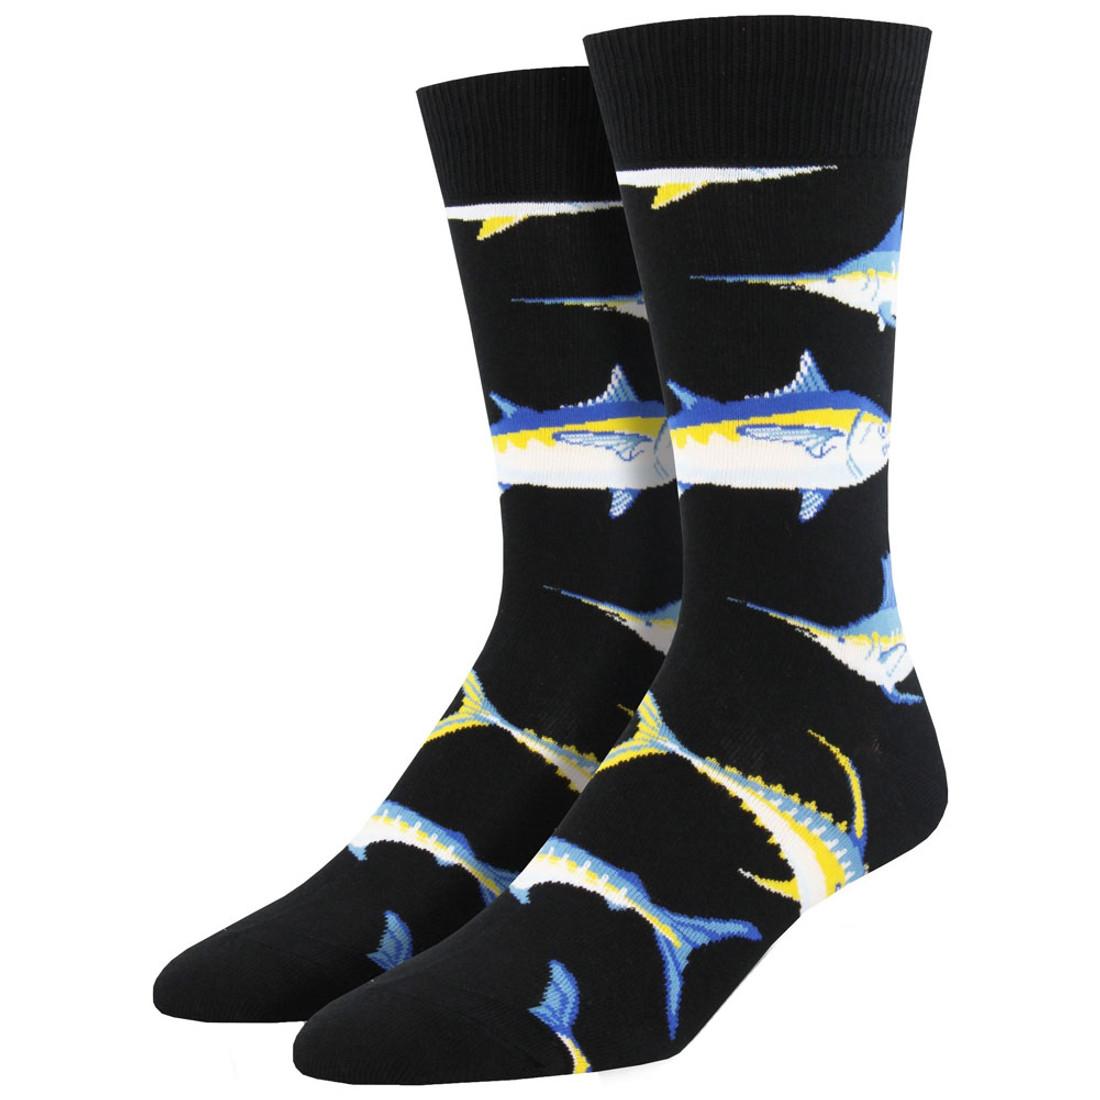 Men's Crew Socks Just For Sport Game Fish Black